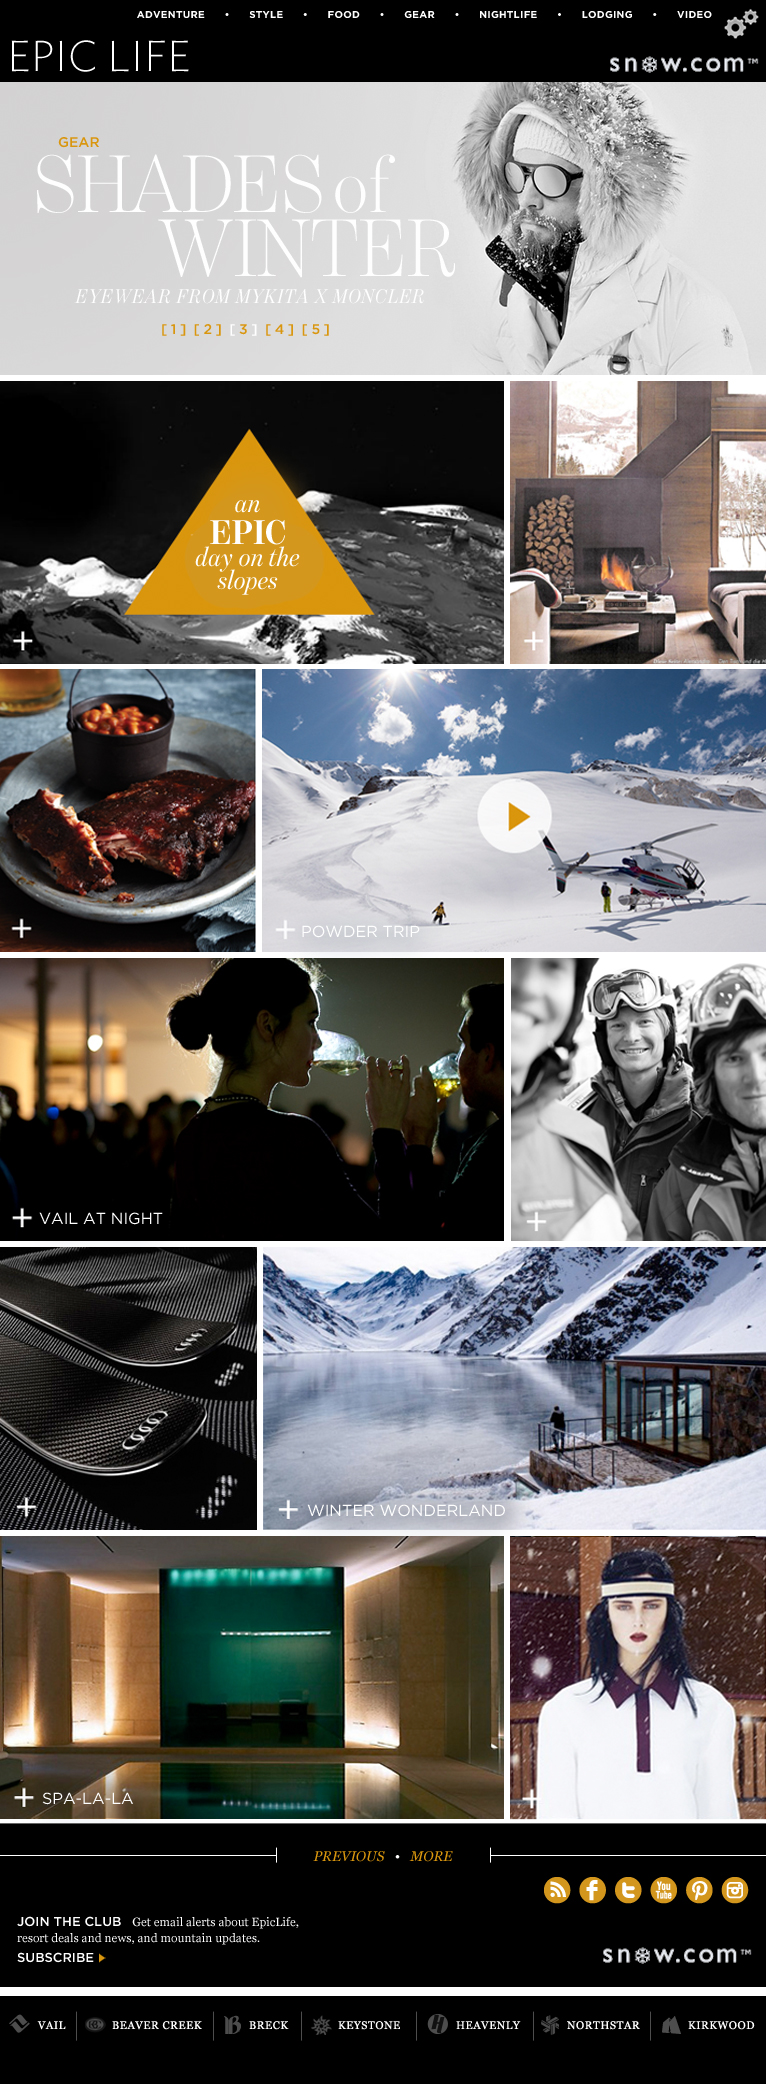 EPIC LIFE Digital Magazine — iPad version — Full view